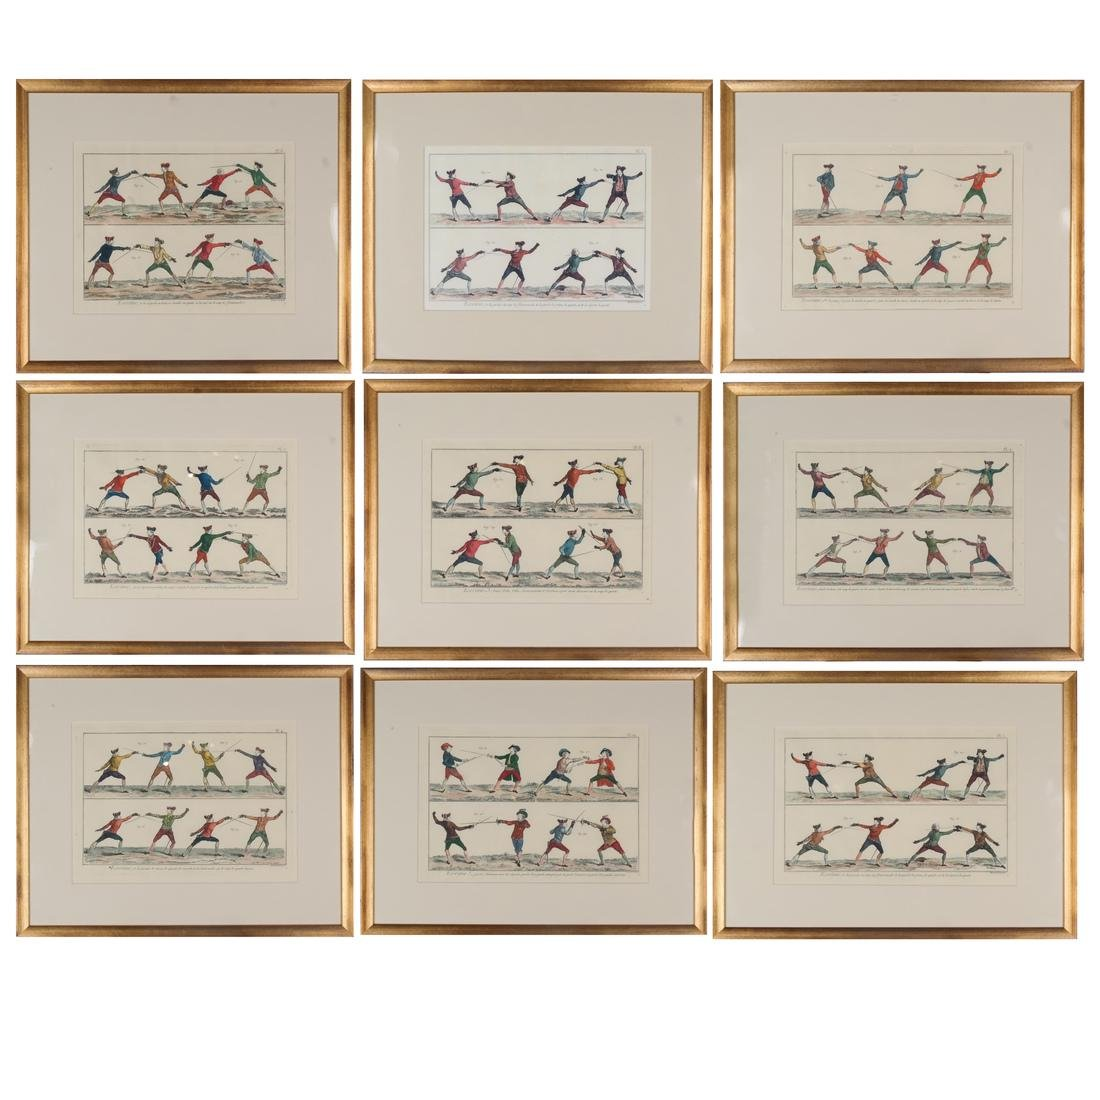 9 Benard Direxit Color Fencing Prints